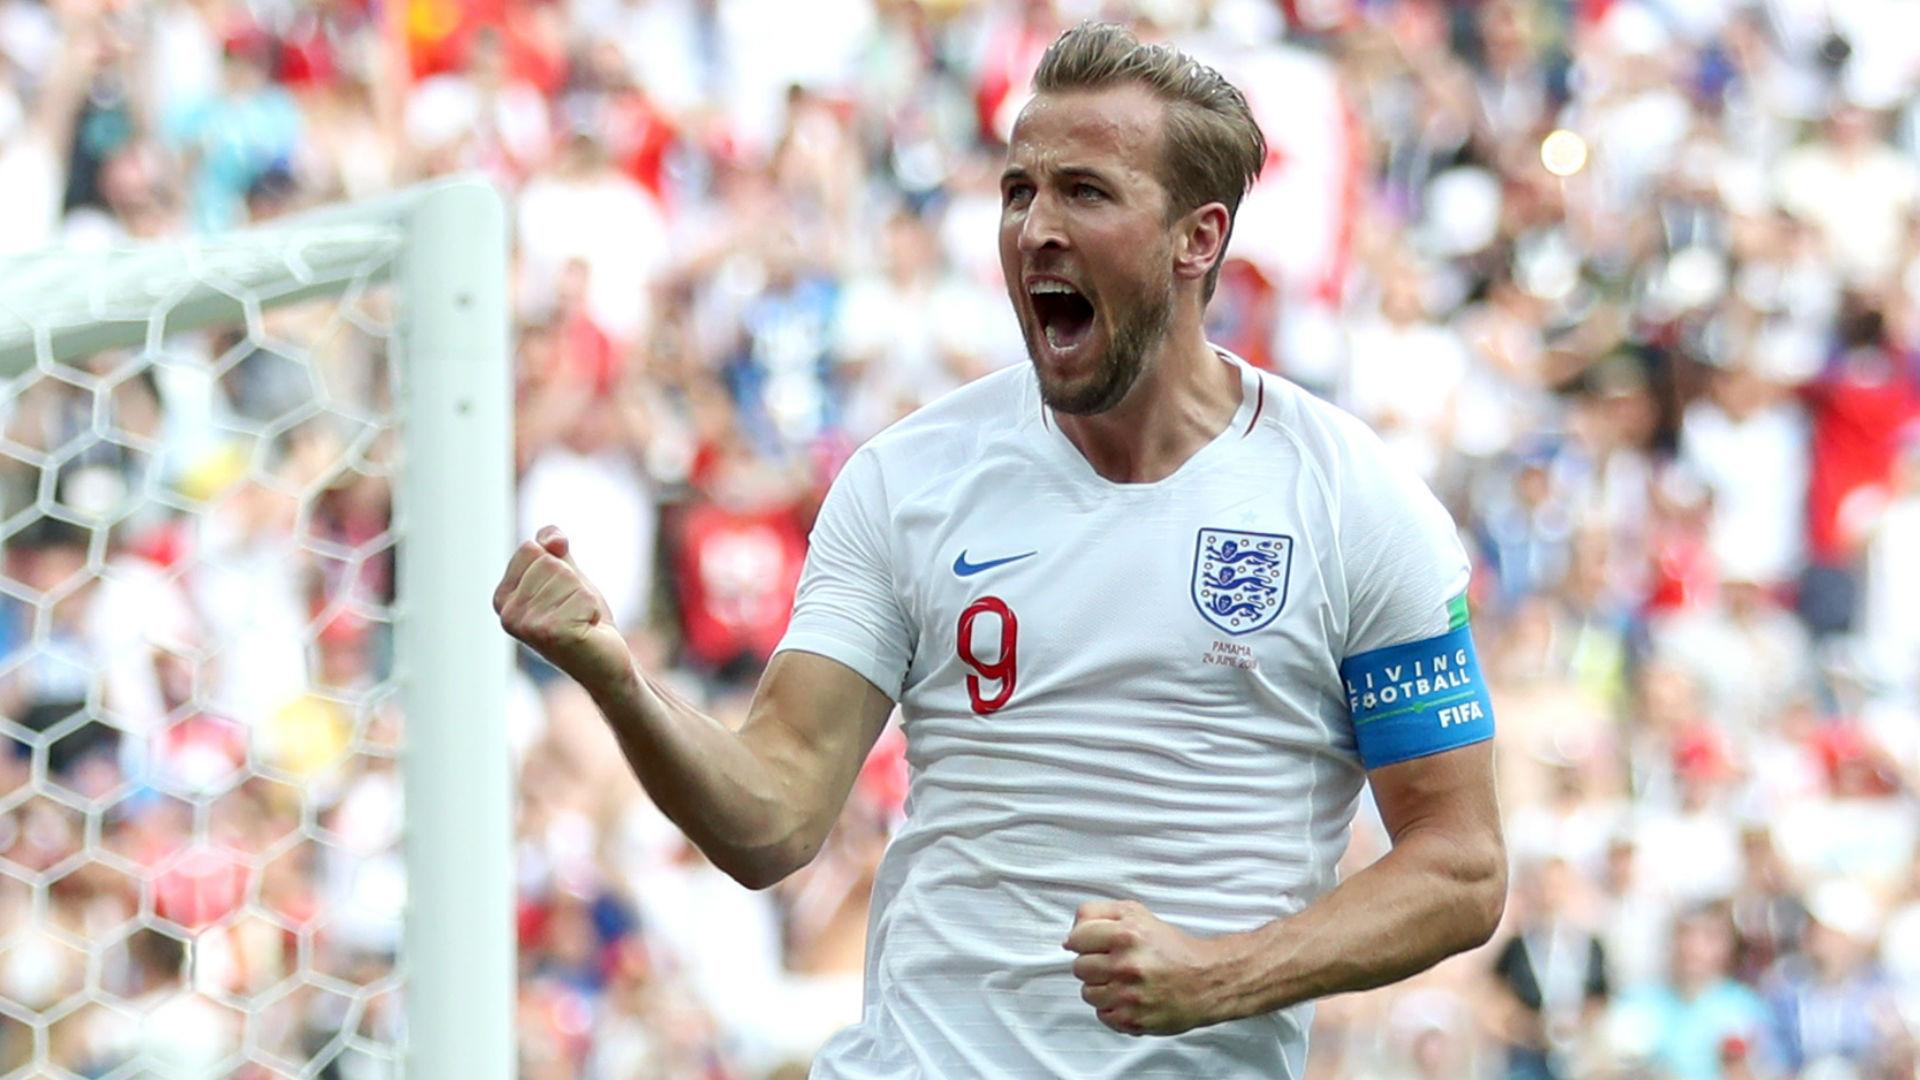 harry-kane-england-panama-world-cup-2018_1ldwpg7nssrxl1rddjy5s31r7x.jpg